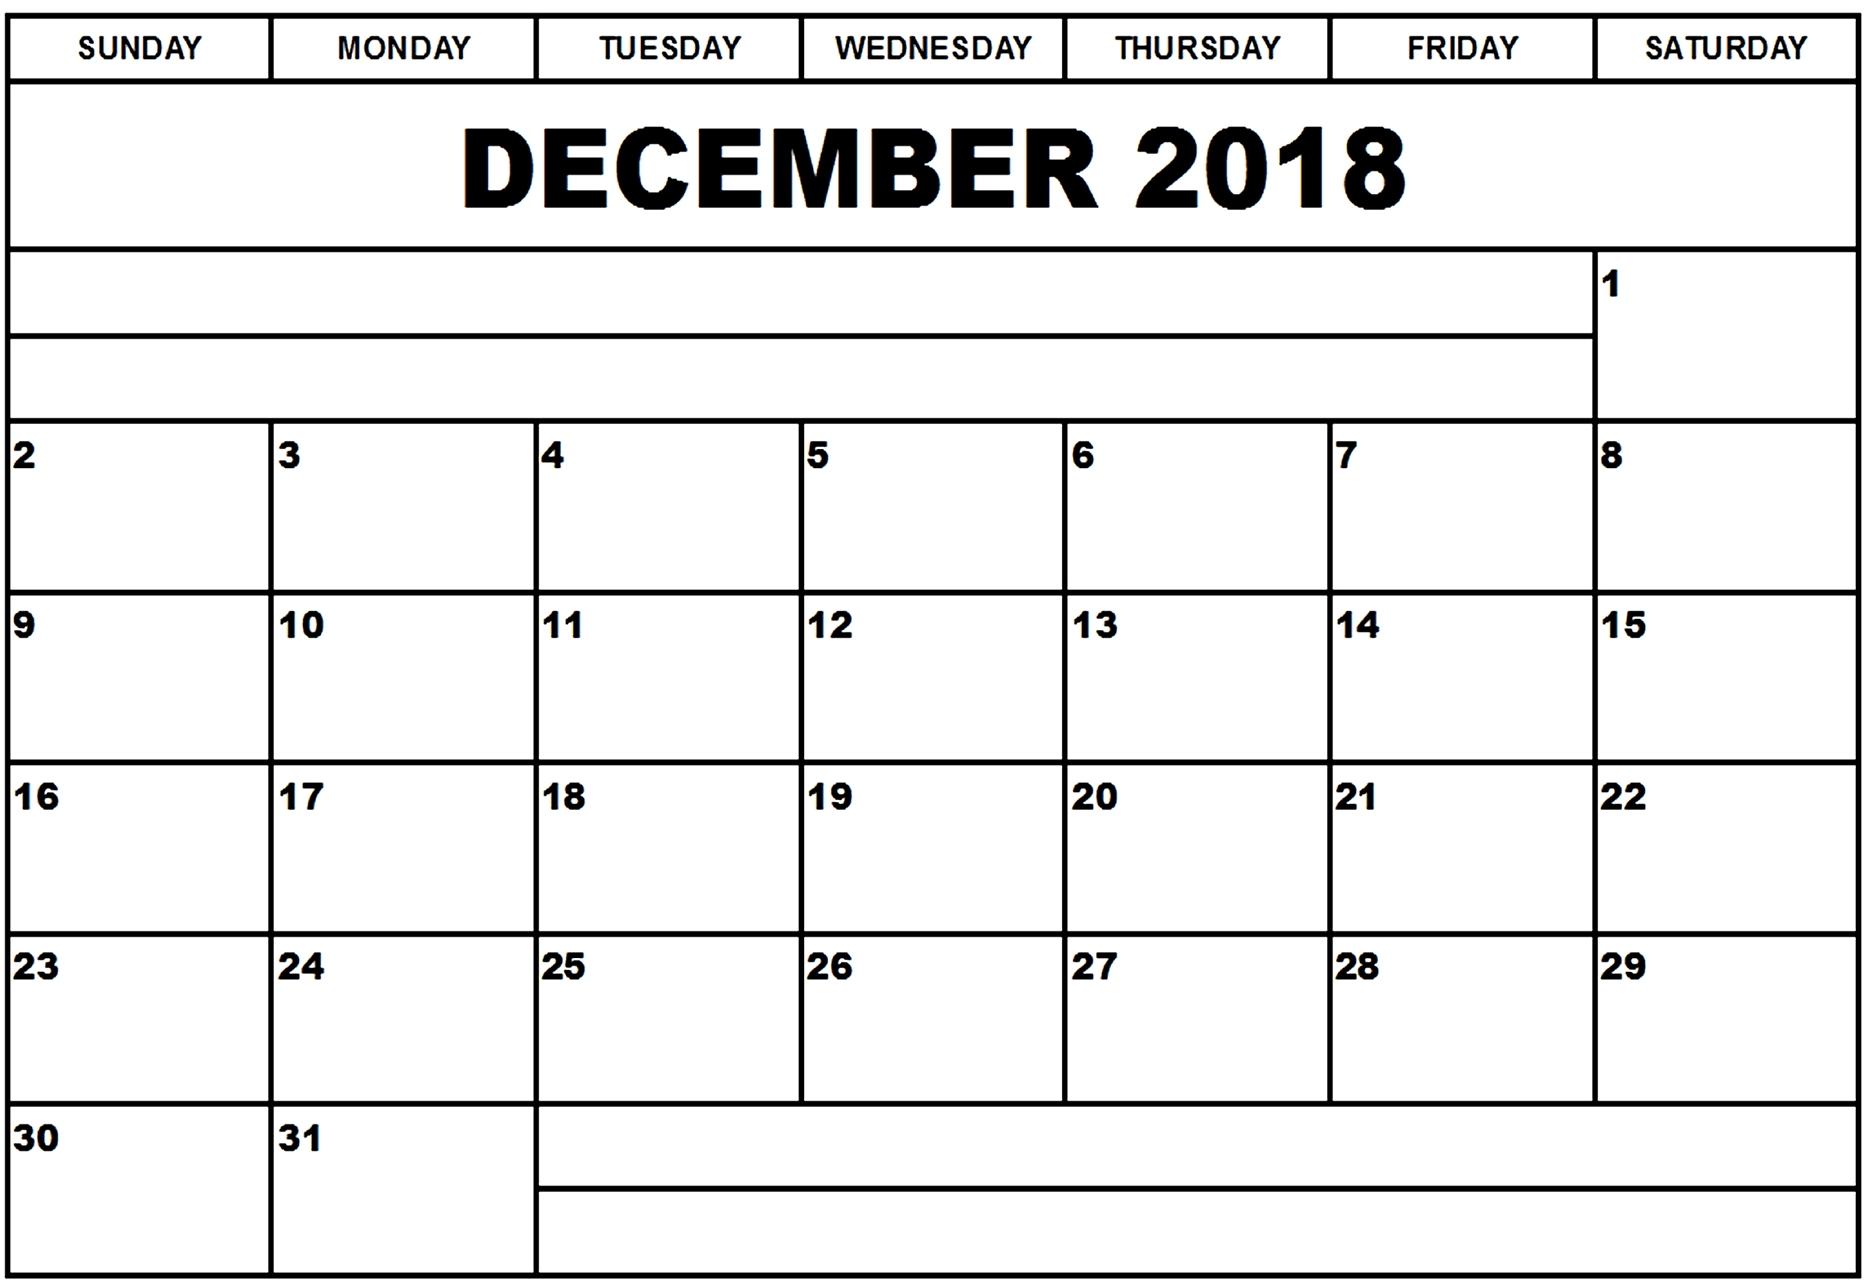 December 2018 Calendar Editable Printable